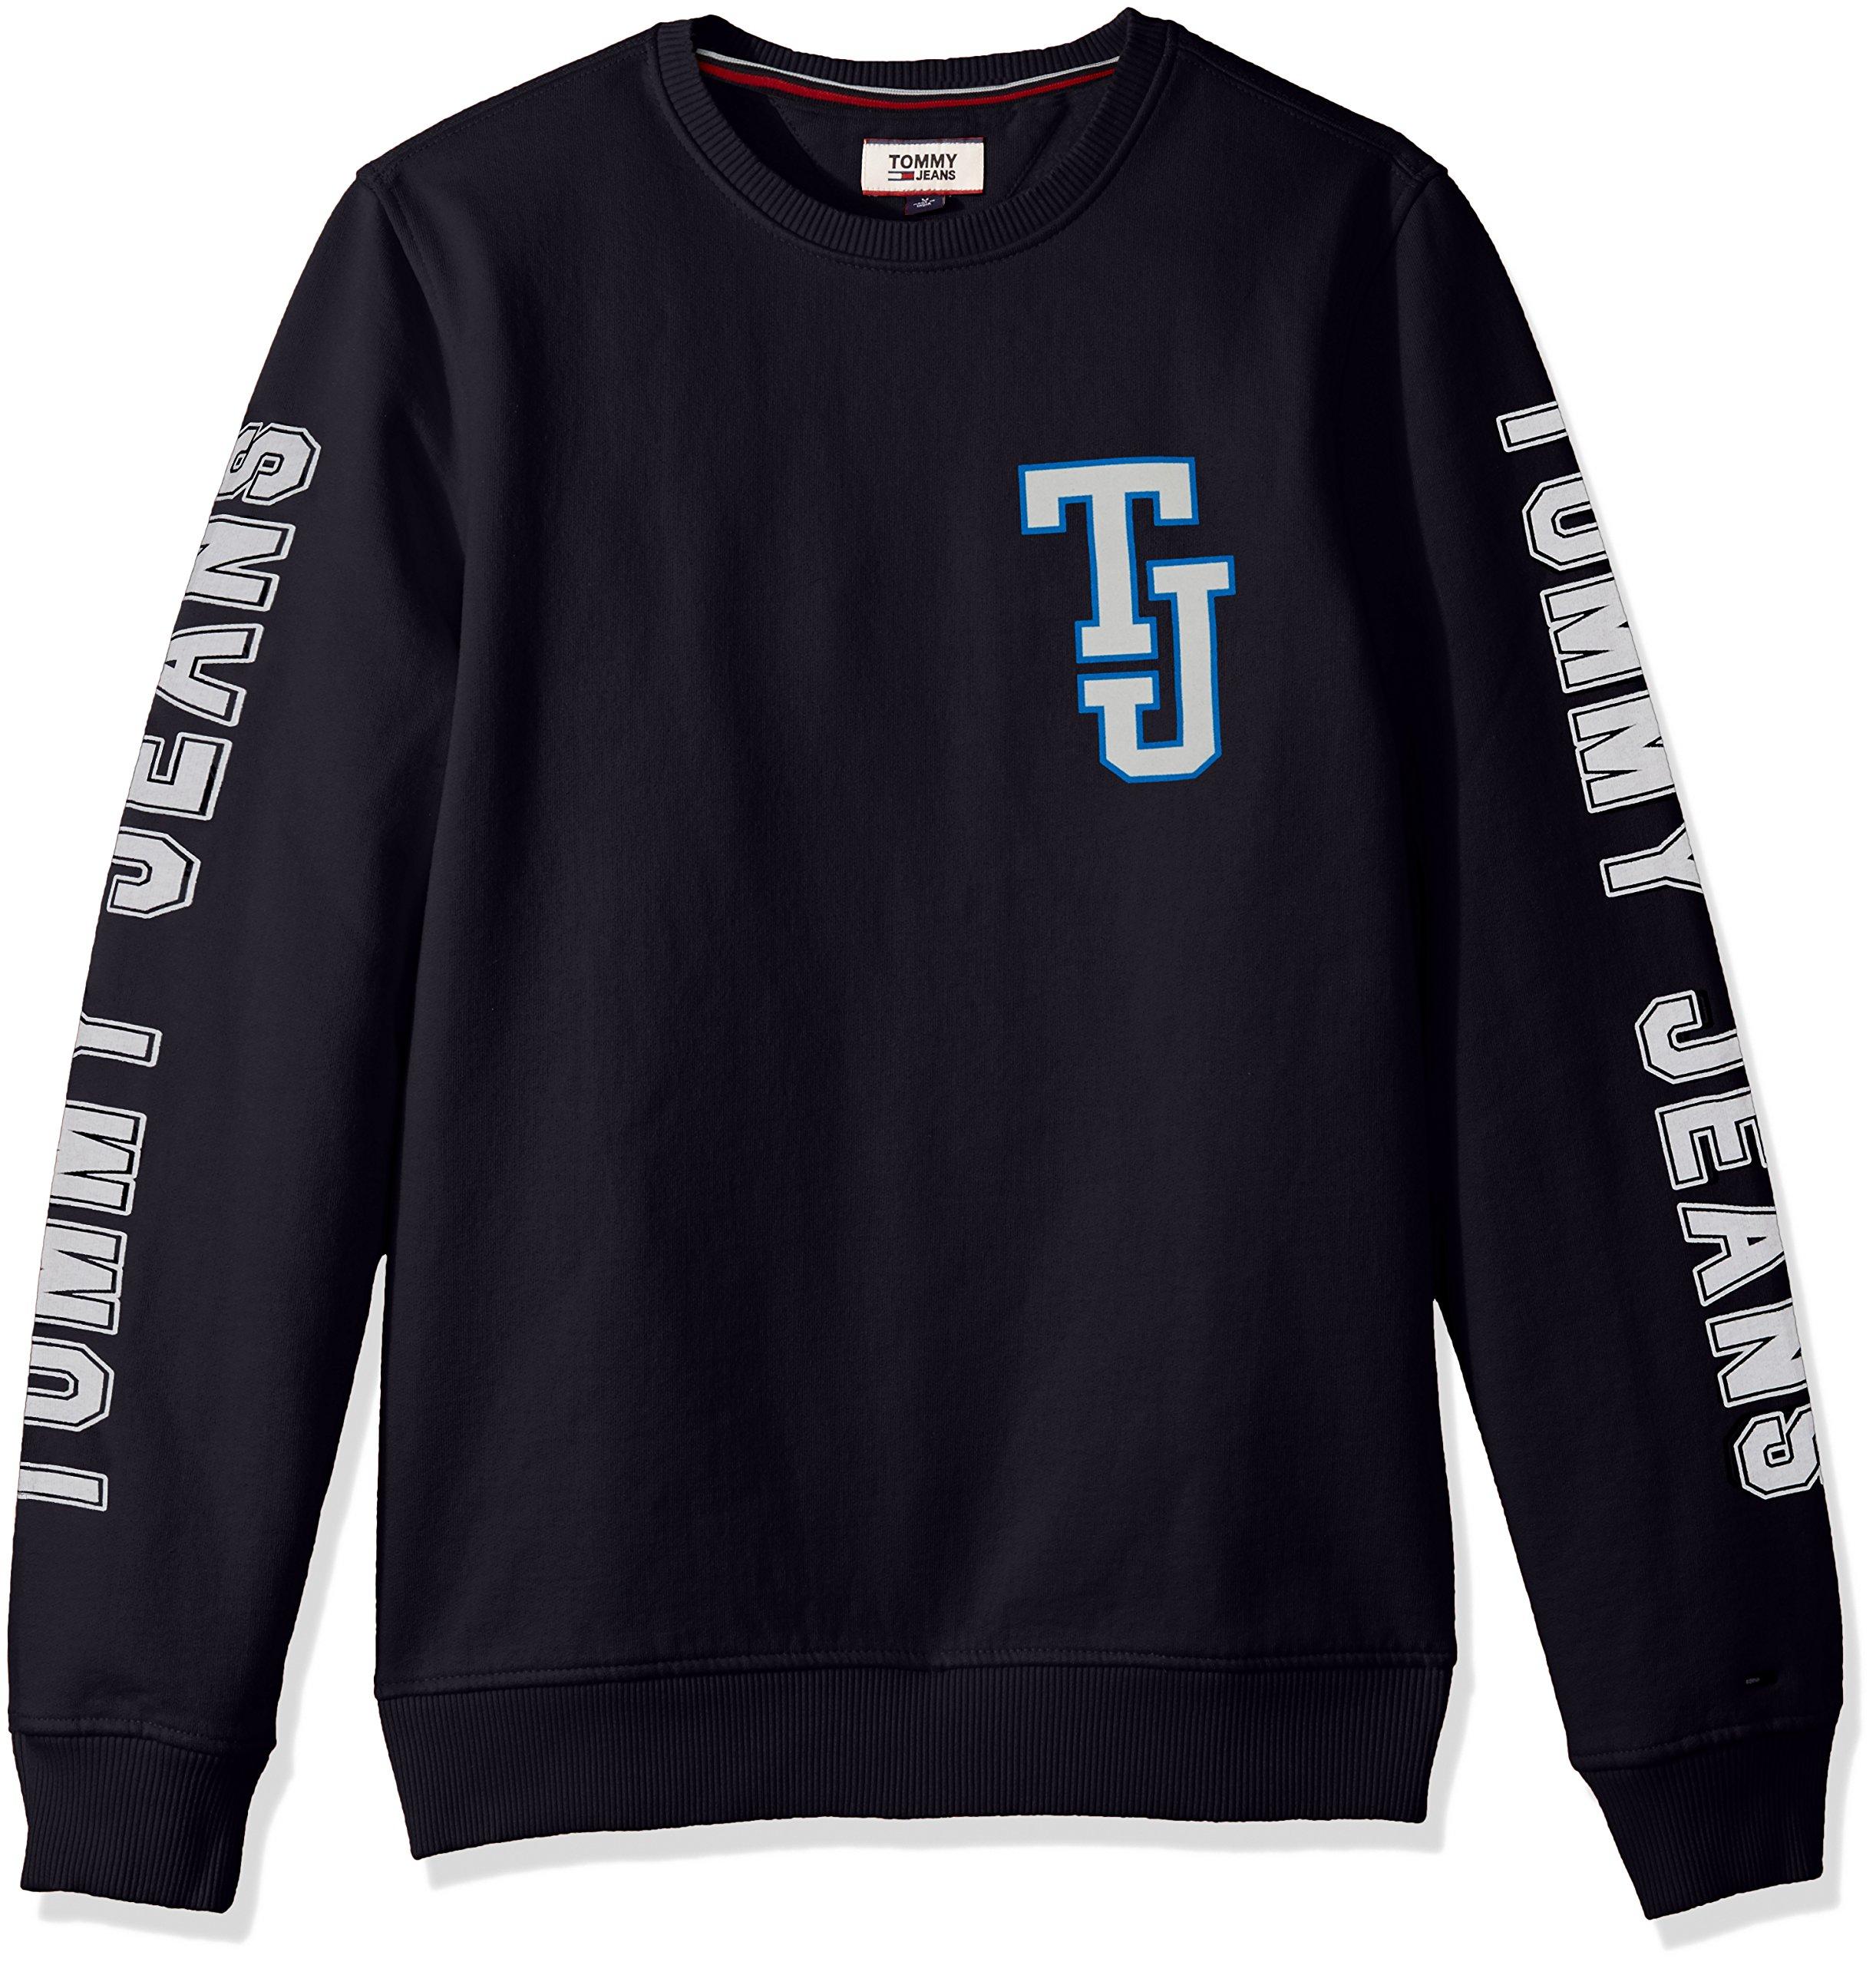 Tommy Jeans Men's Sweatshirt Crewneck